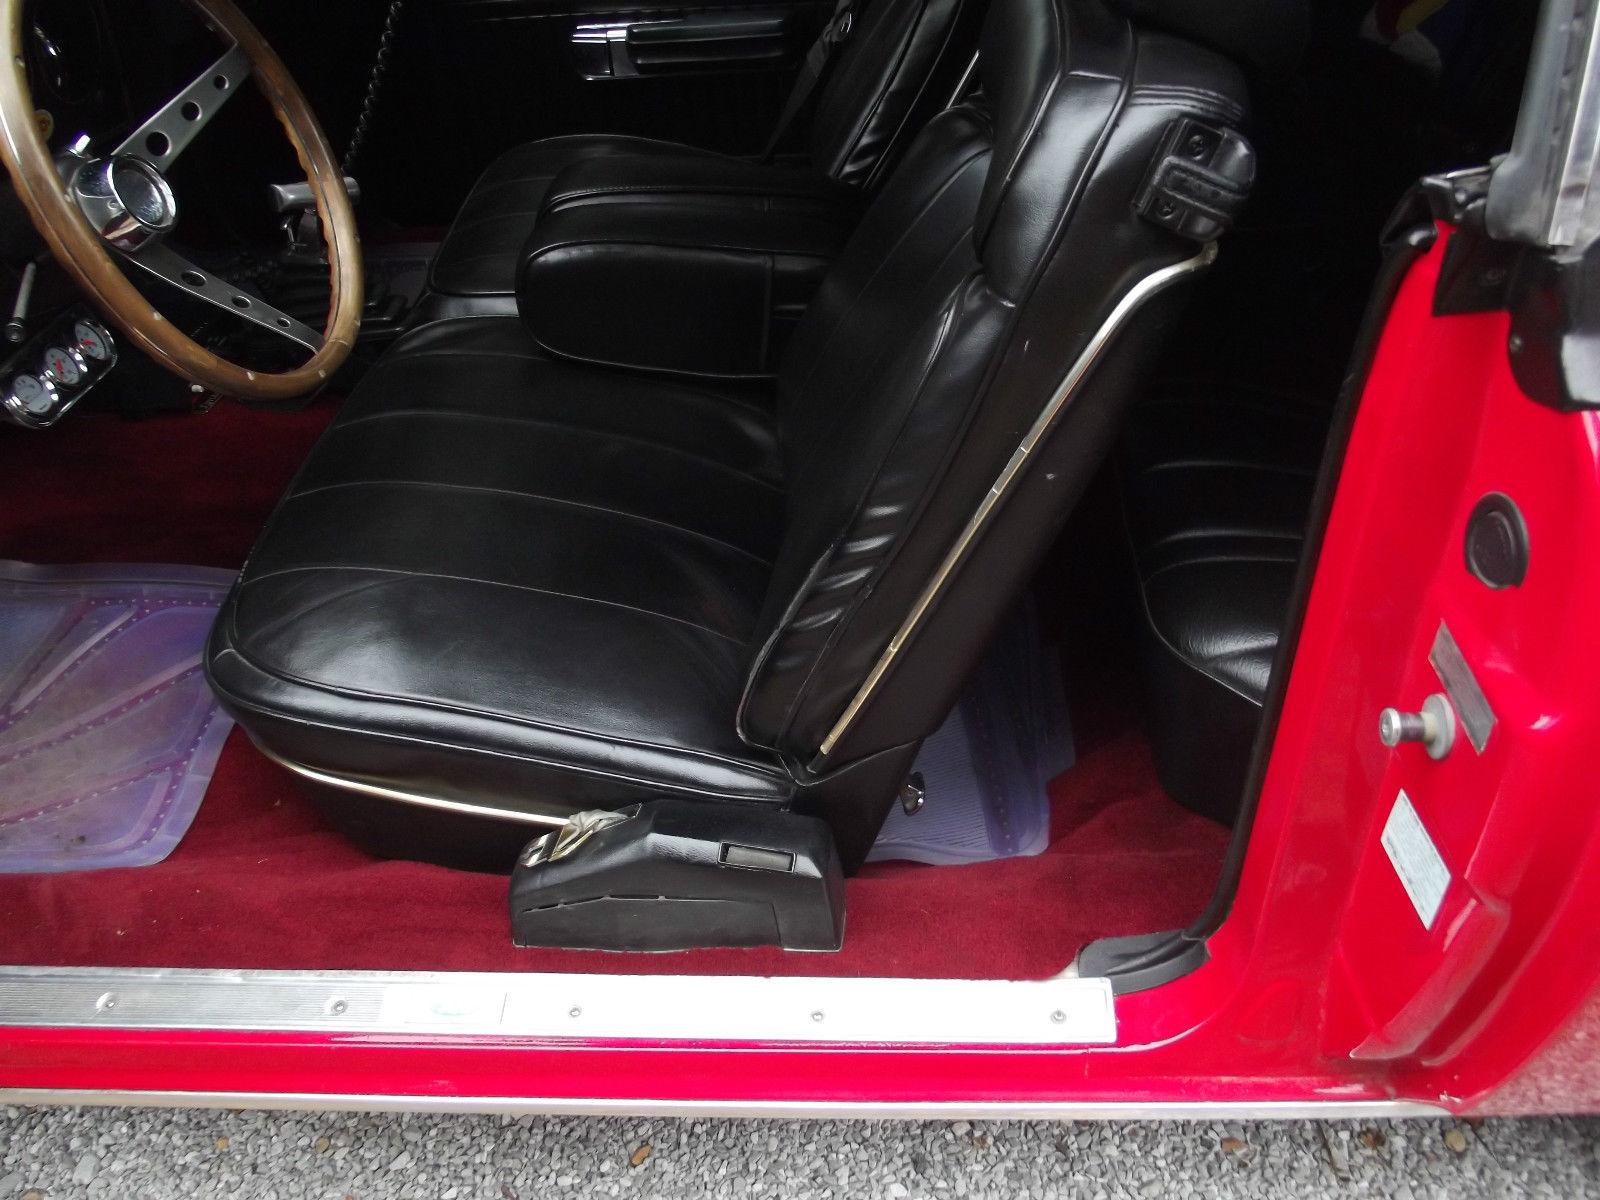 1976 ford gran torino base hardtop 2 door 5 8l starsky n hutch classic ford torino 1976 for sale. Black Bedroom Furniture Sets. Home Design Ideas